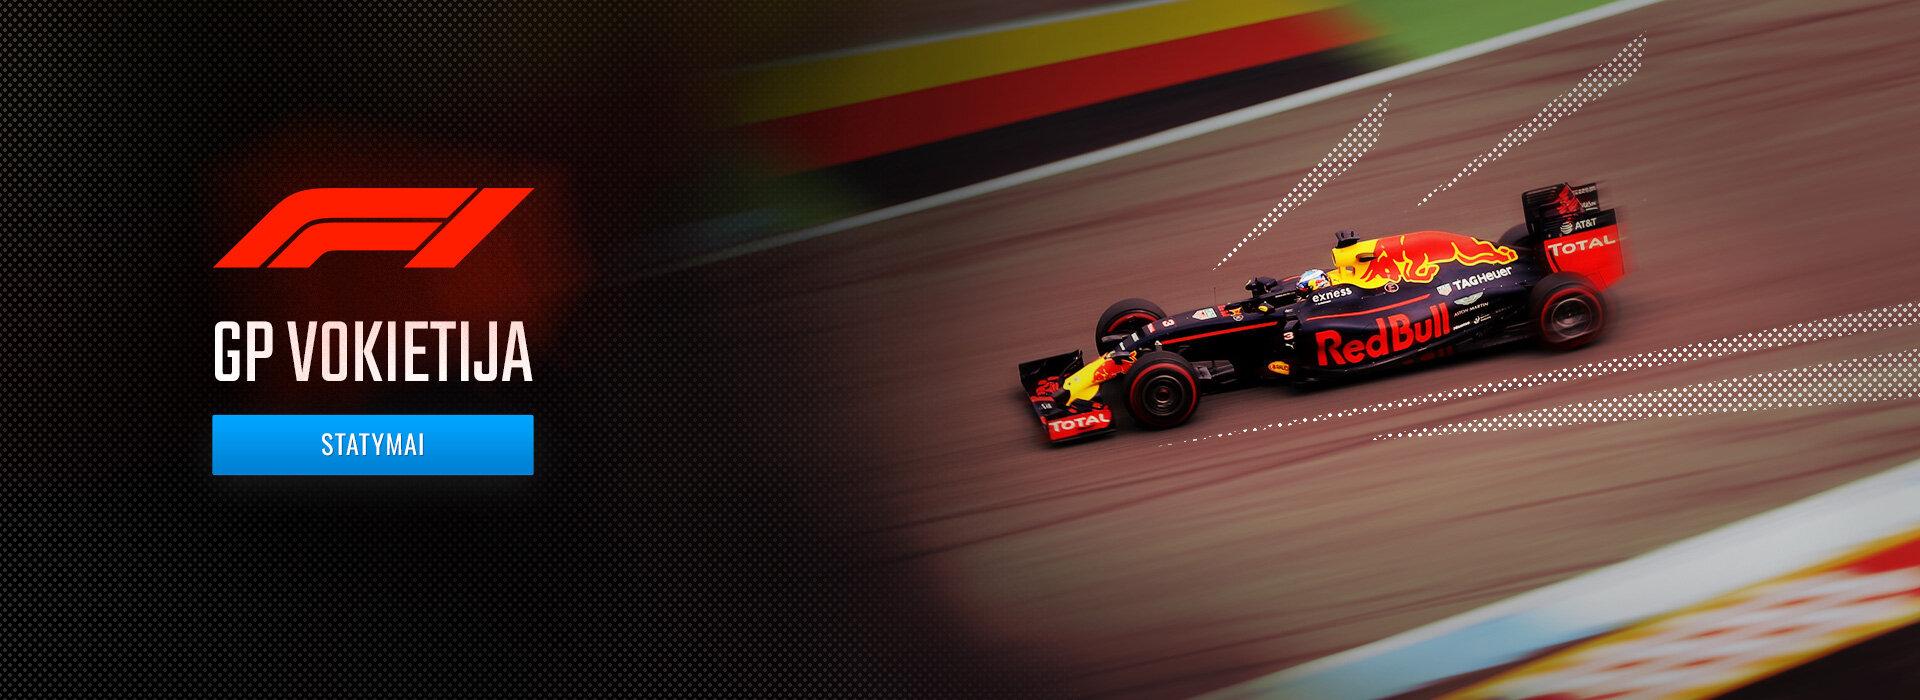 Formule 1 Vokietija